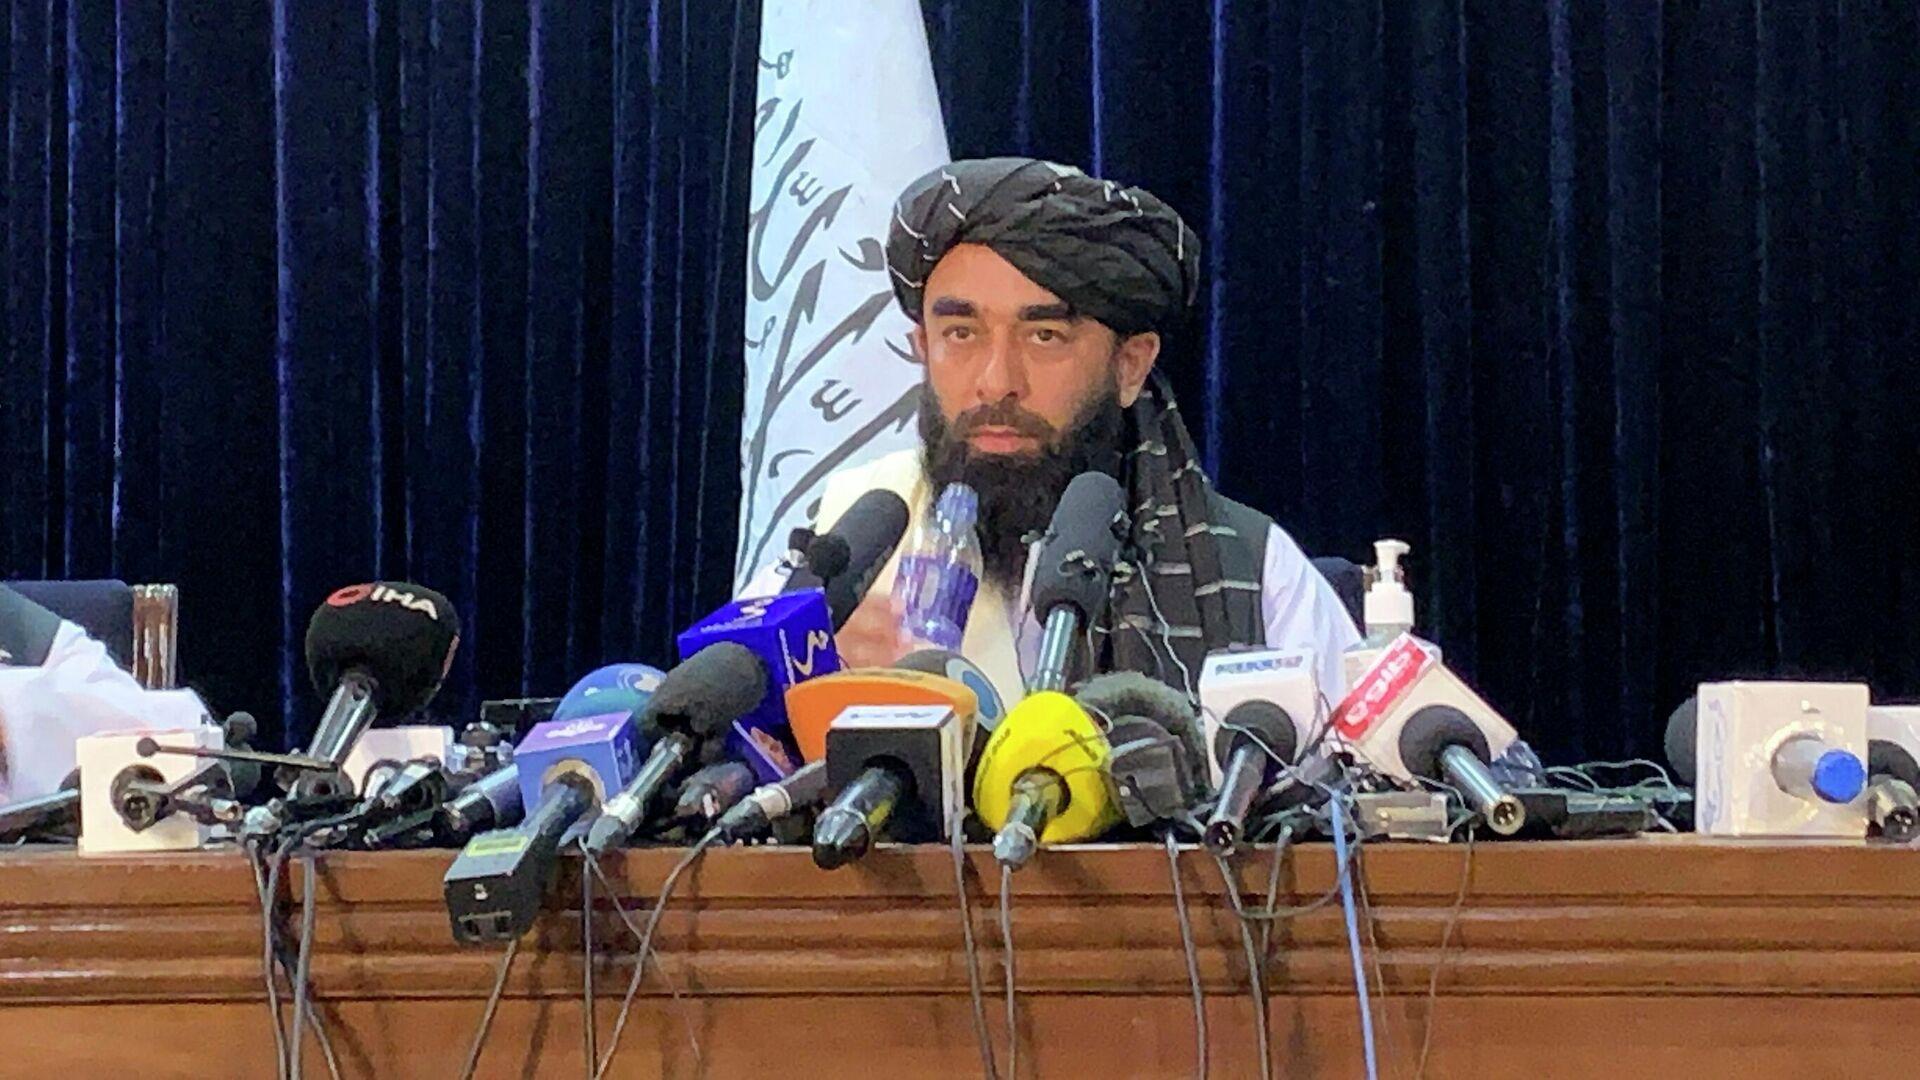 Представитель Талибана* Забихулла Муджахид во время пресс-конференции в Кабуле - РИА Новости, 1920, 07.09.2021